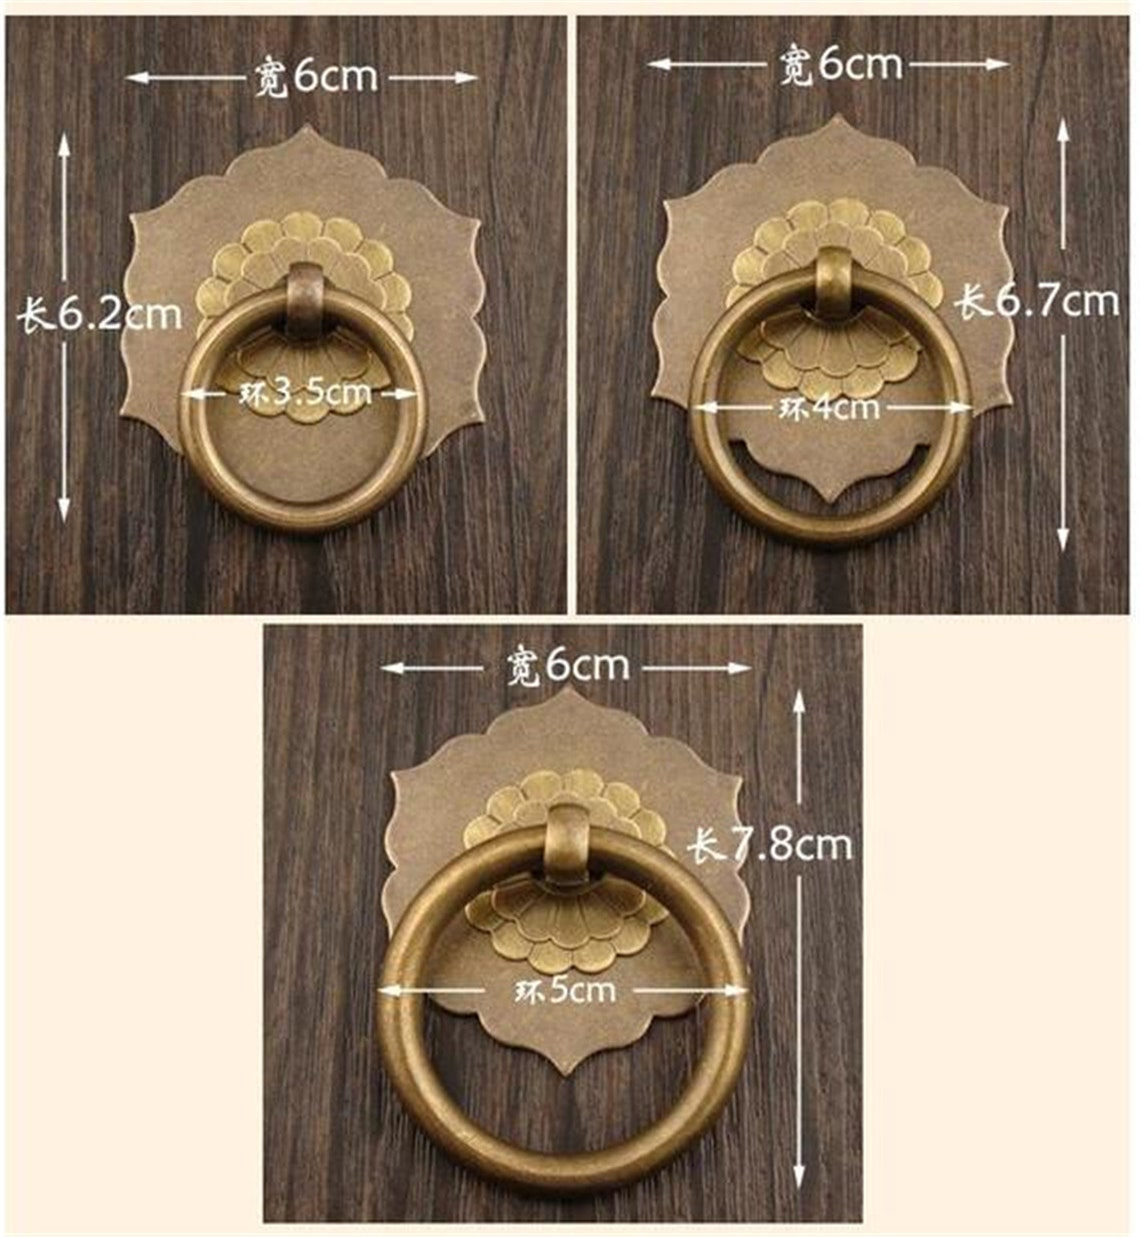 Custom listing for  46 pieces  back plate  Dresser Pulls Knobs Kitchen Cabinet Door Knobs Handles Cupboard Hardware Decor